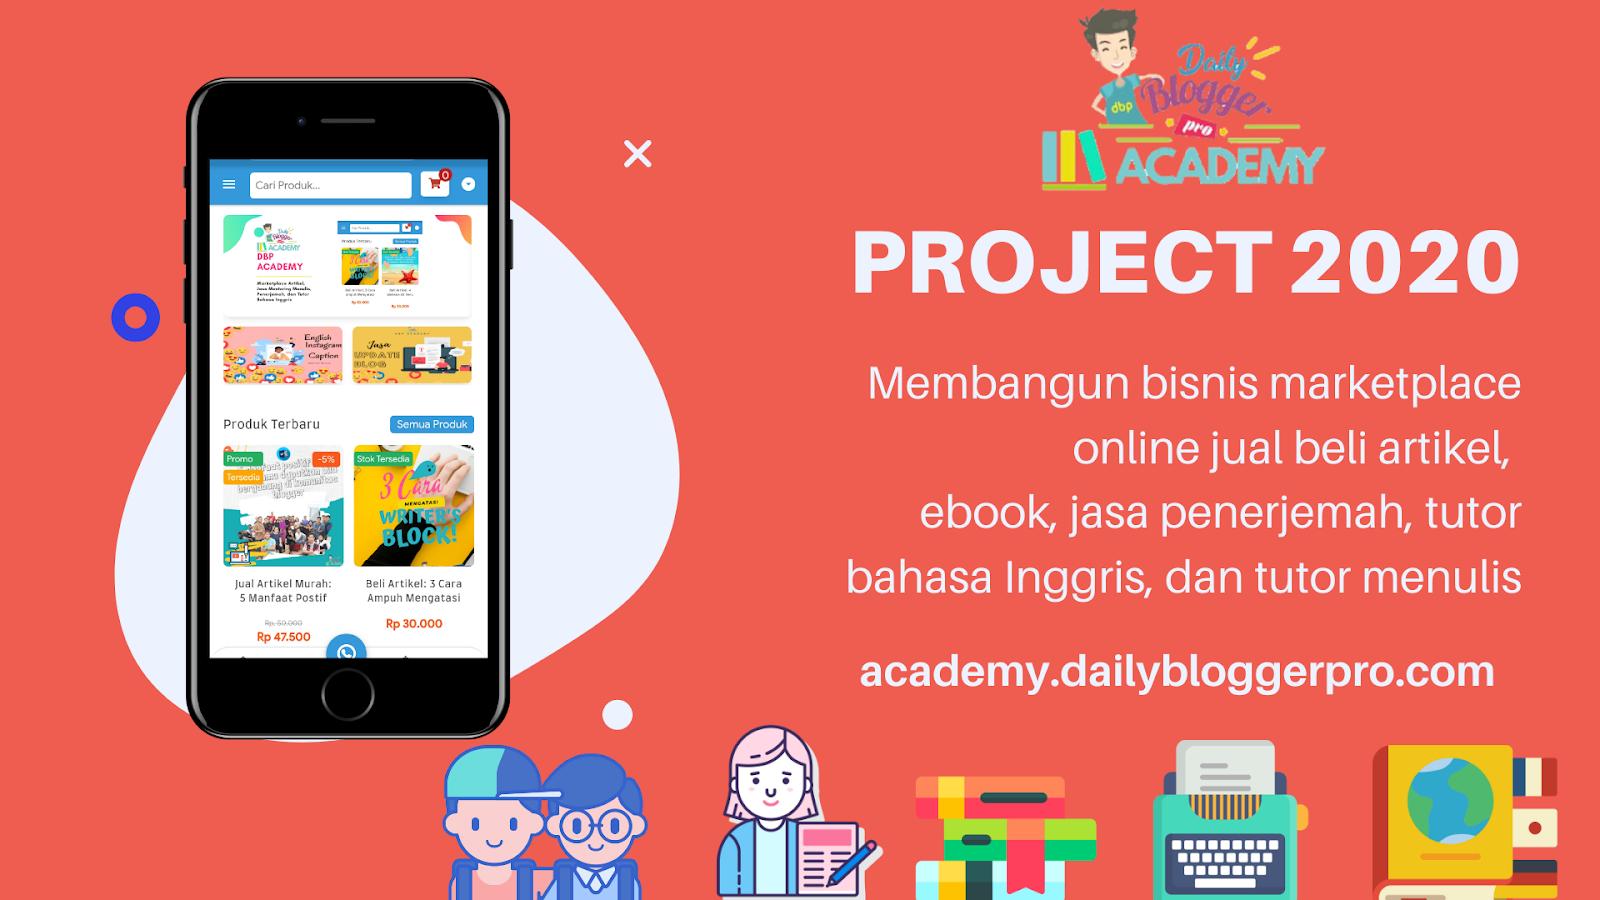 Project 2020: Buka Usaha Marketplace Online Jual Beli Artikel, Jasa Penerjemah, Ebook, Tutor Bahasa Inggris, dan Tutor Menulis